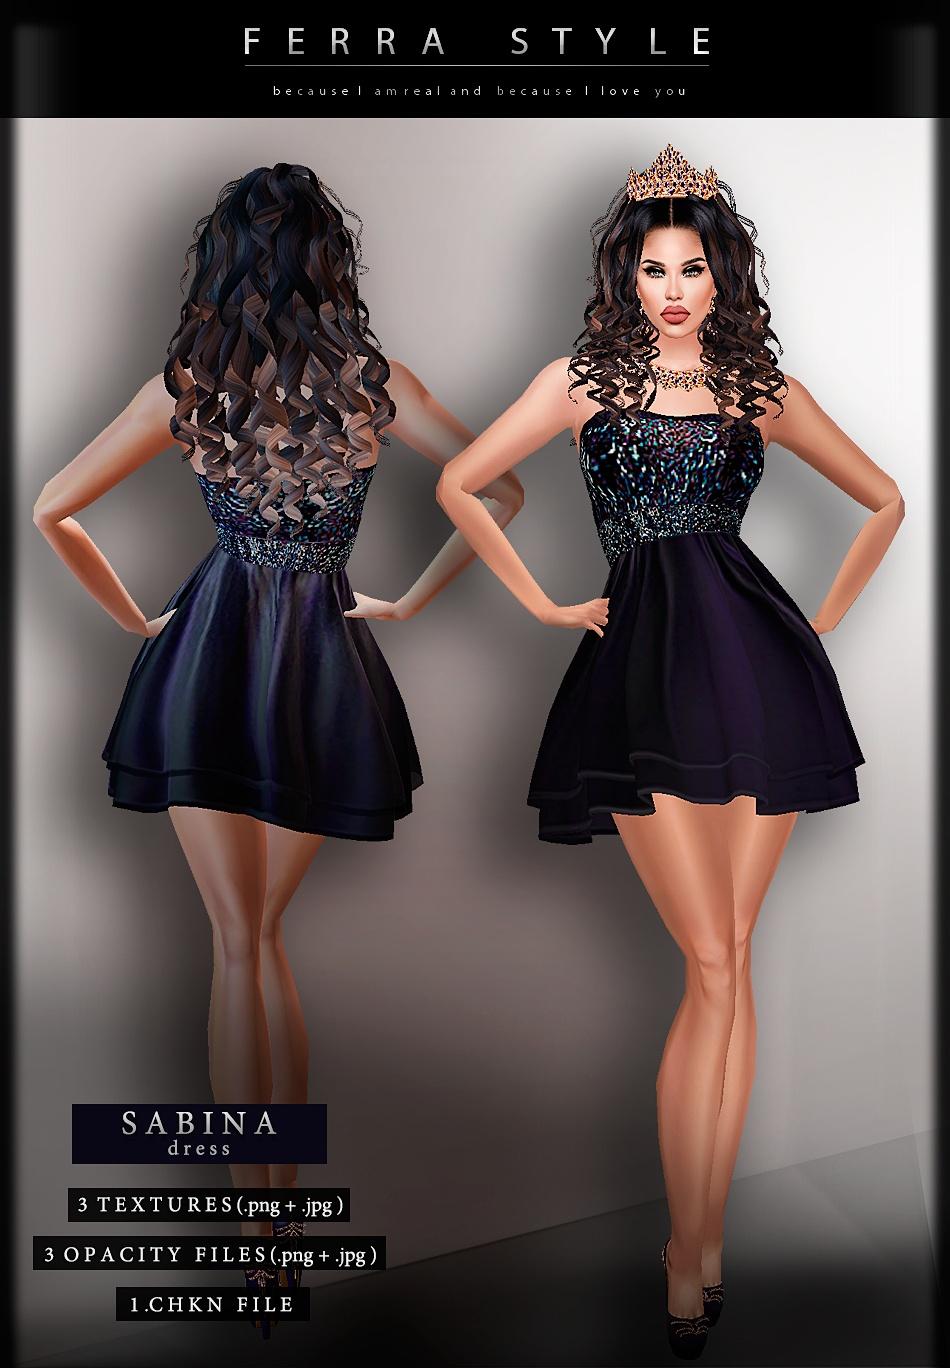 :: SABINA DRESS ::